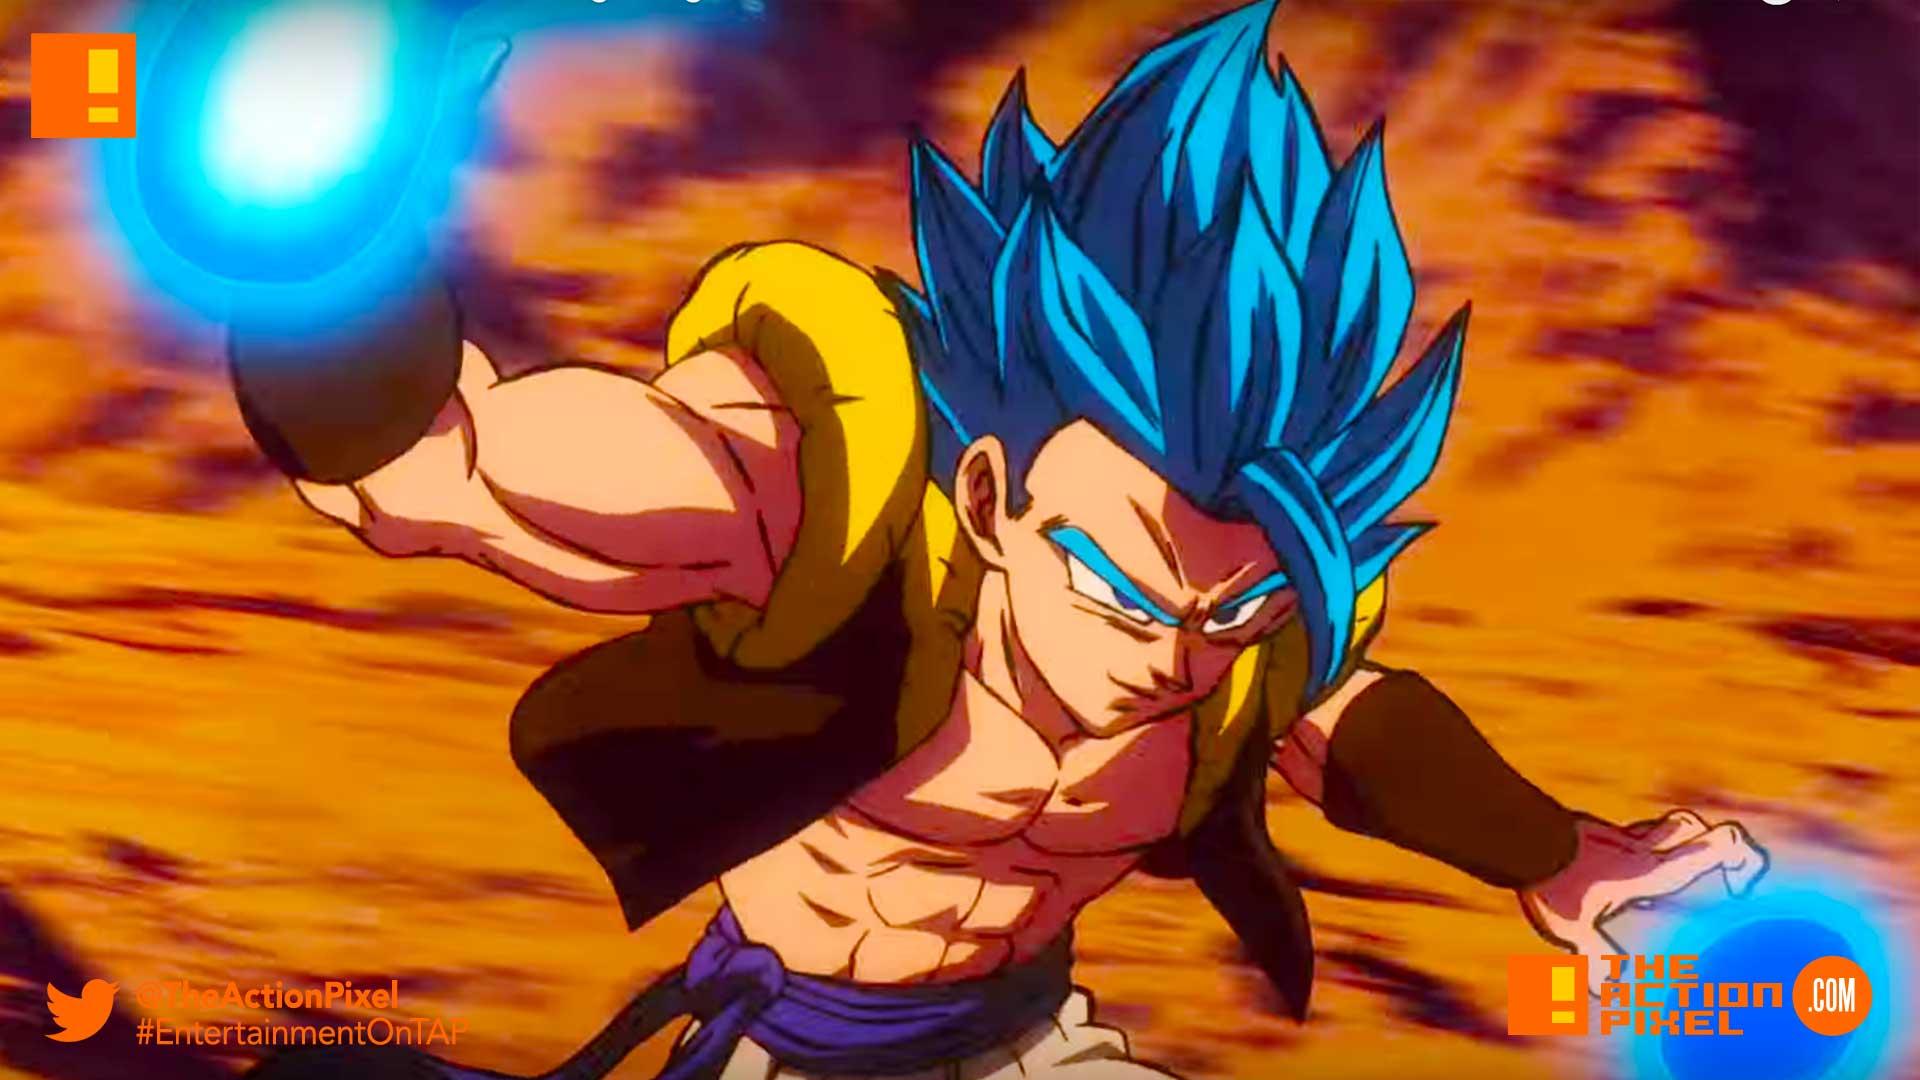 dragon ball super: broly, anime, dbz, dragon ball z, dragonball z, the action pixel, entertainment on tap, trailer, bandai namco entertainment , bandai namco,